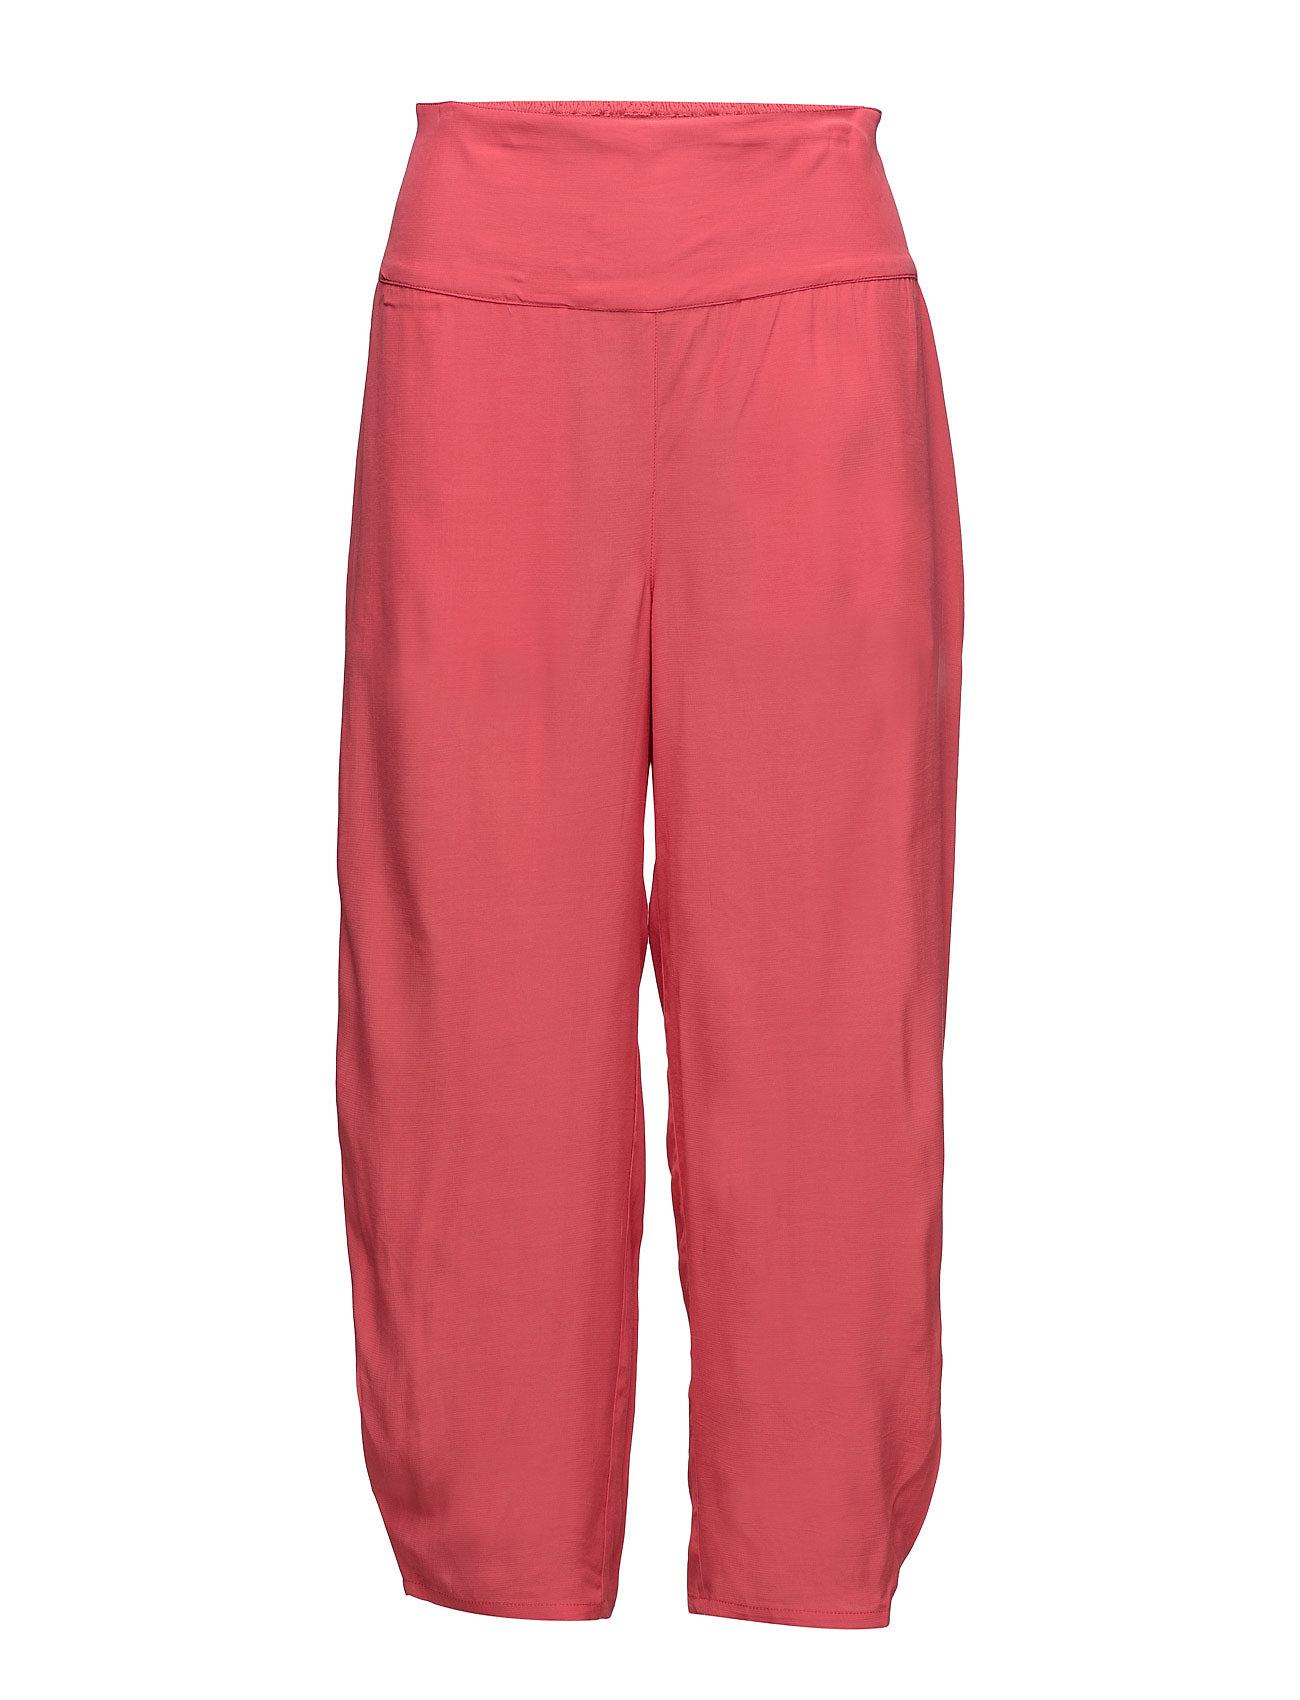 Penny Culotte Mw Smock Masai Casual bukser til Damer i